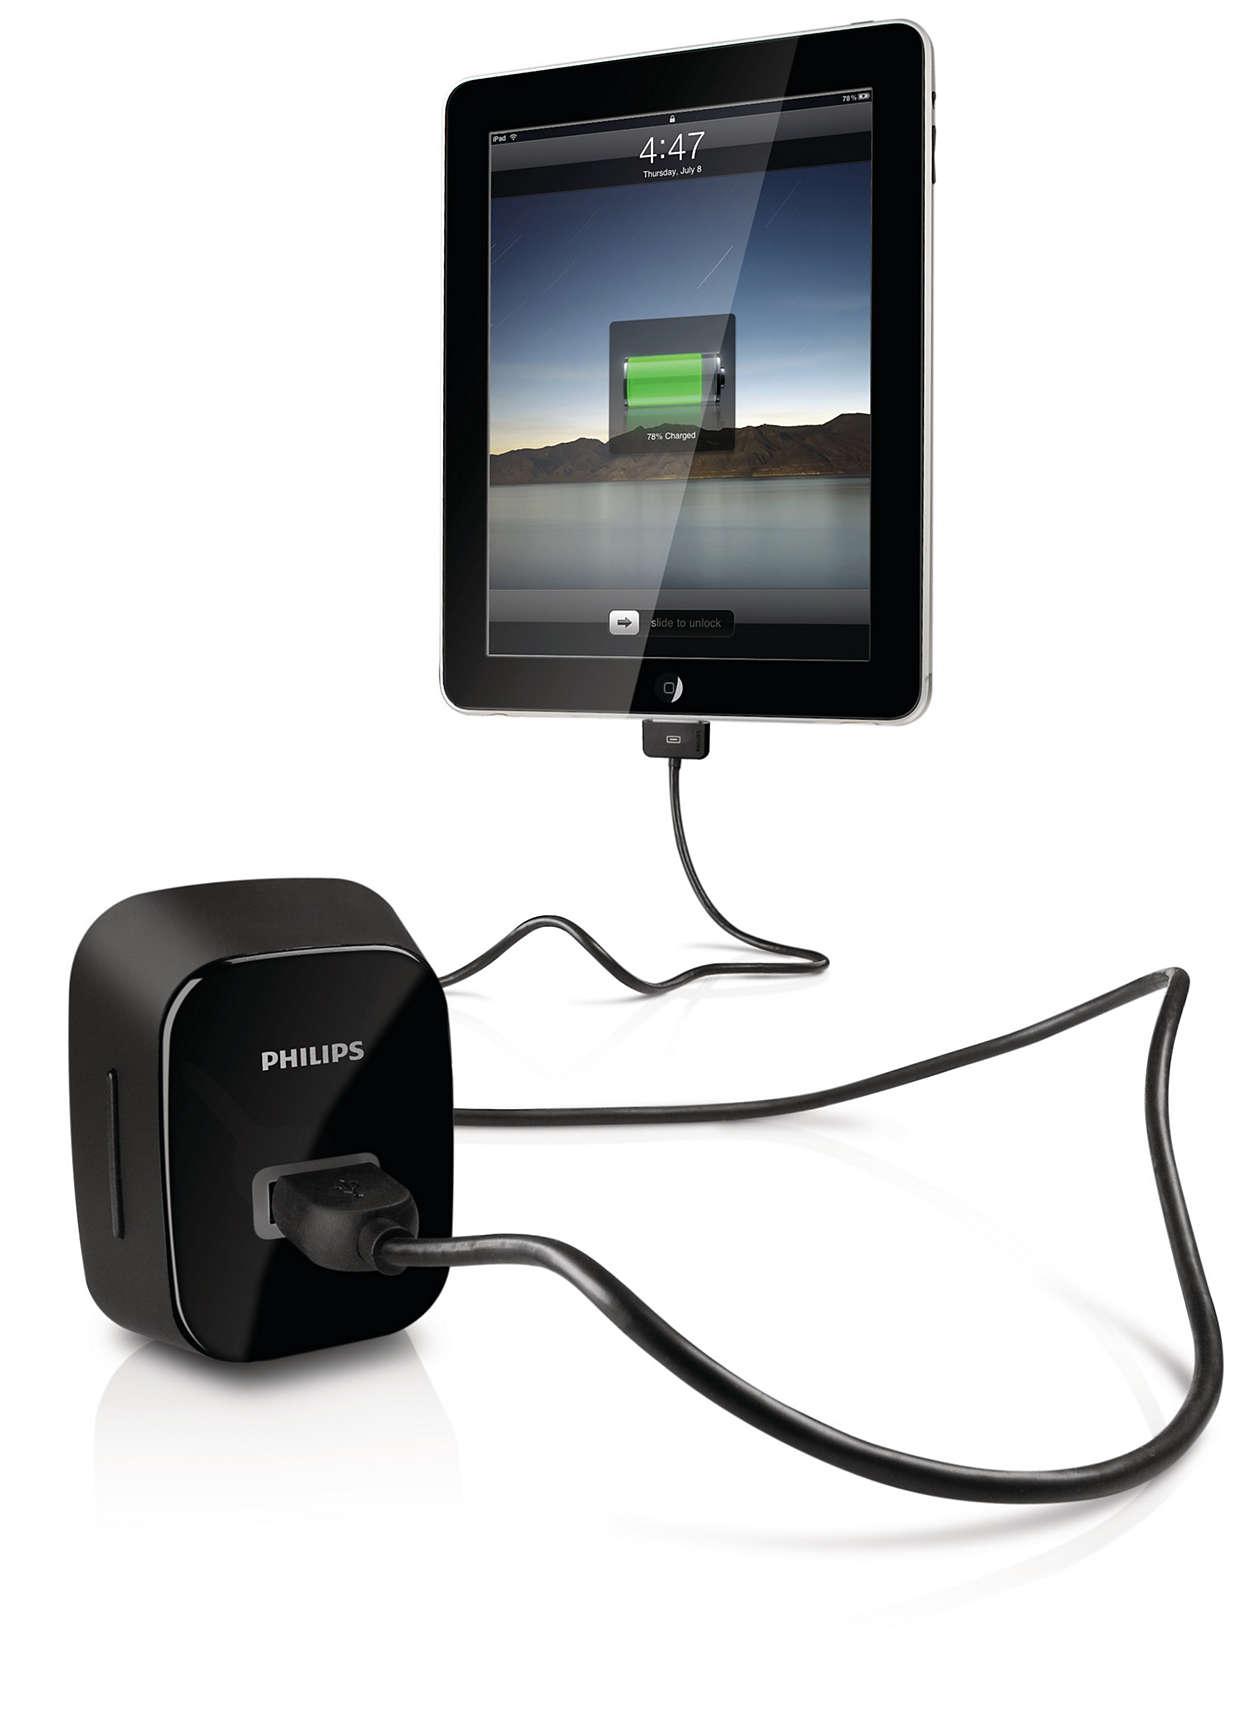 為 iPad、iPhone、iPod 充電